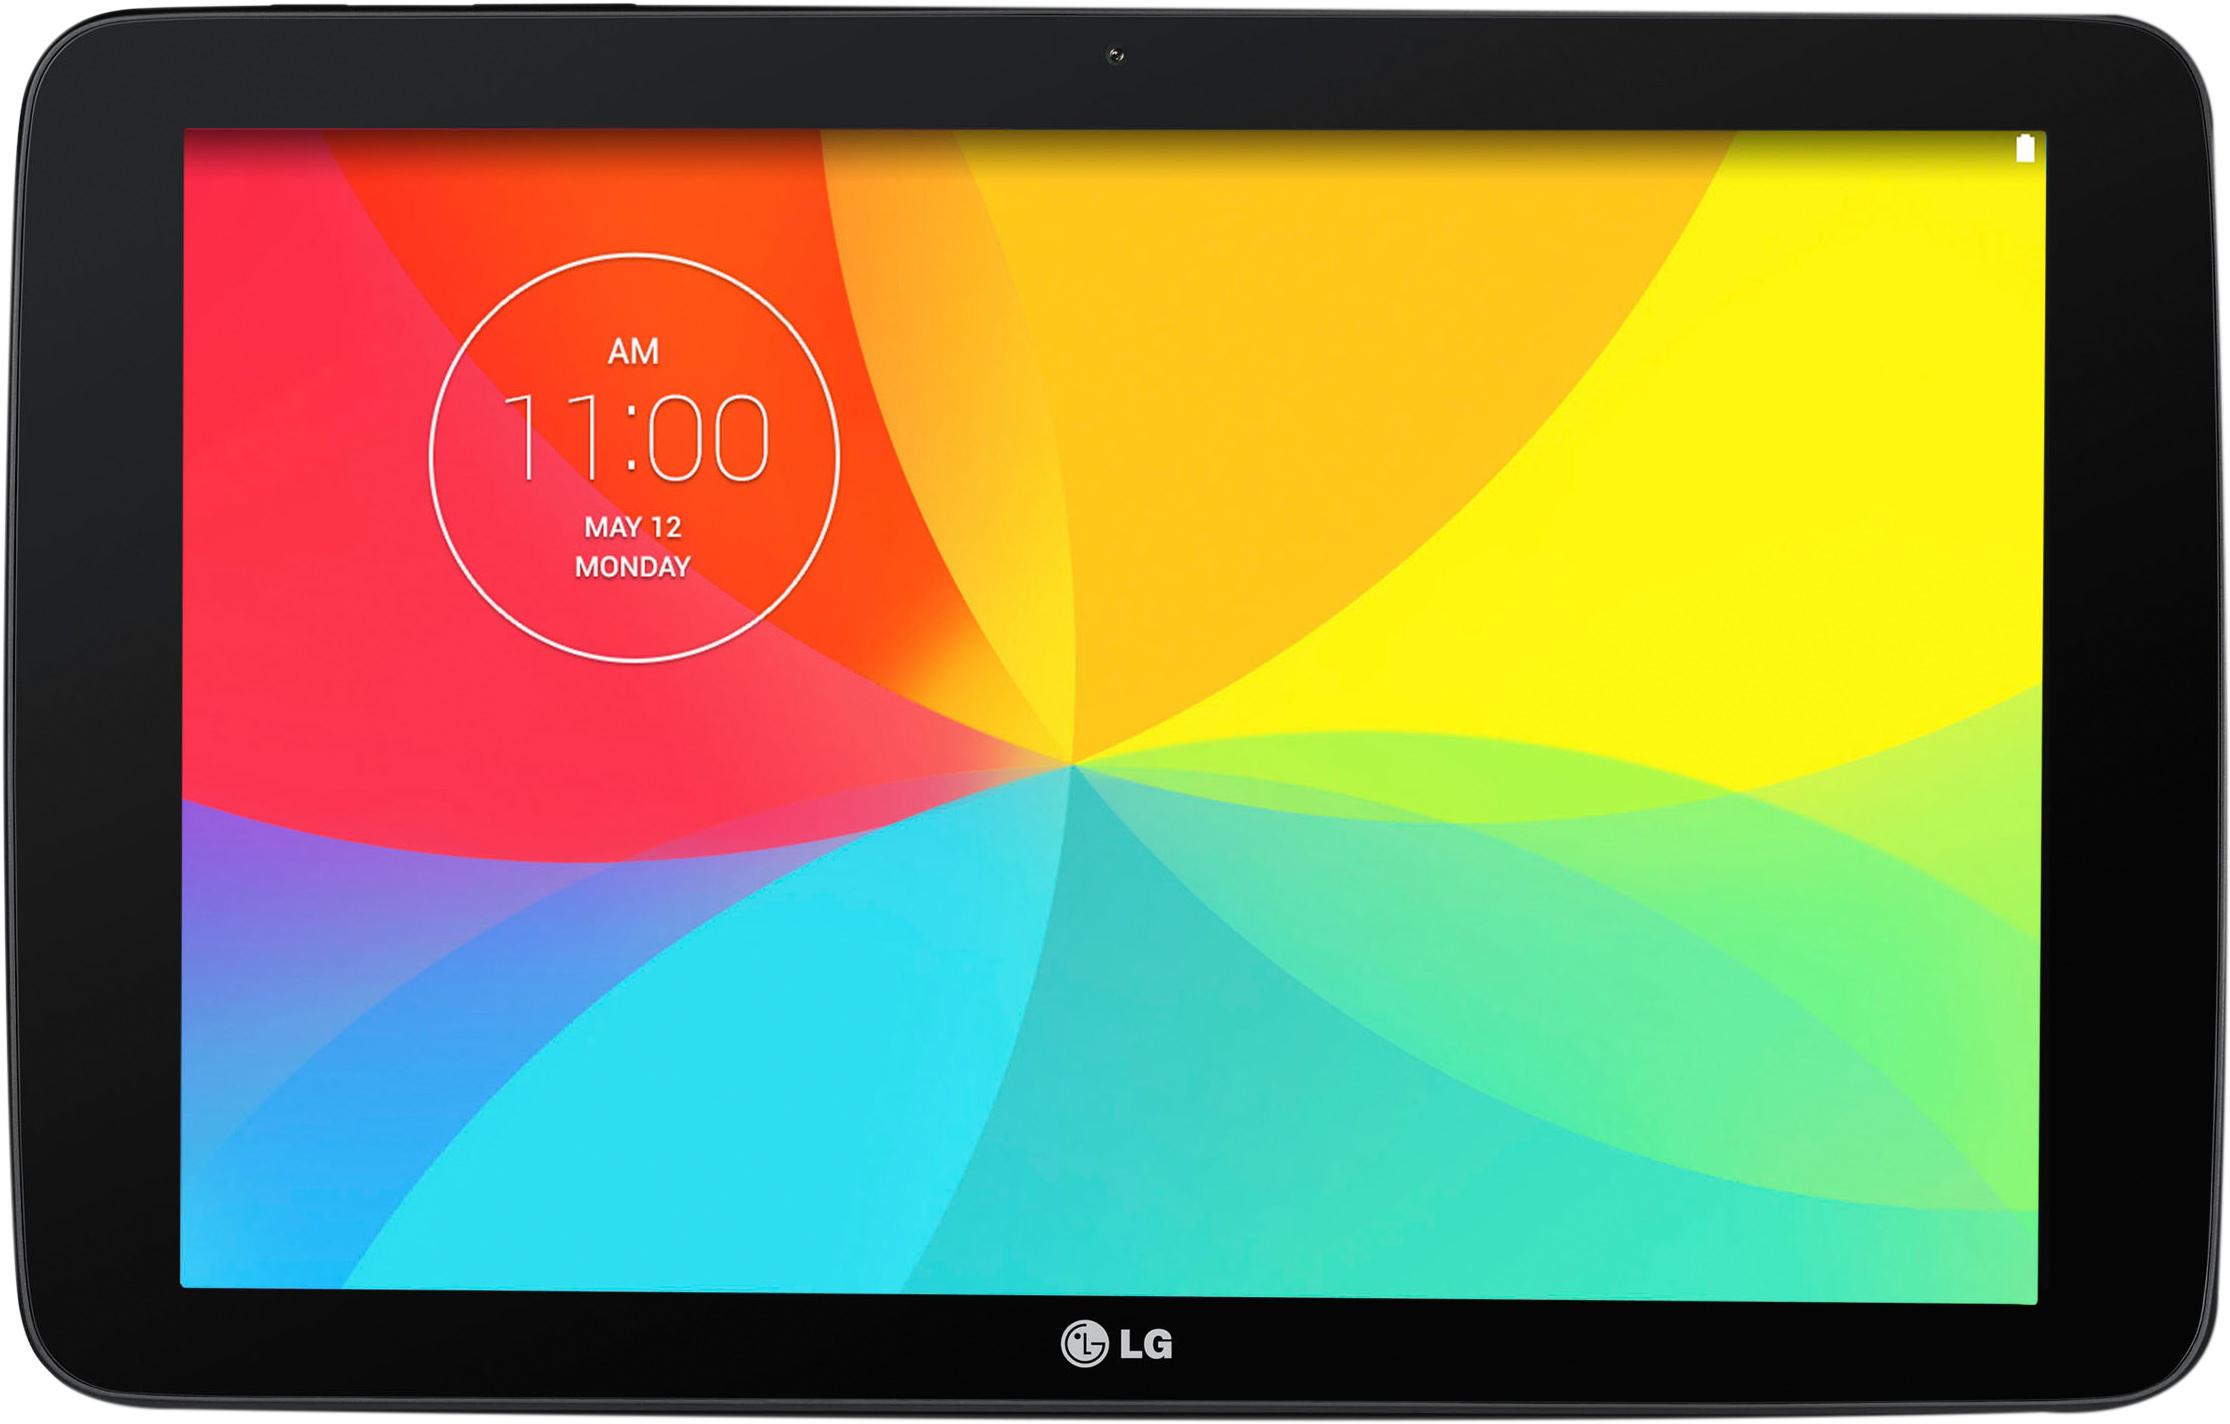 TS-LG-G-Pad-10.1